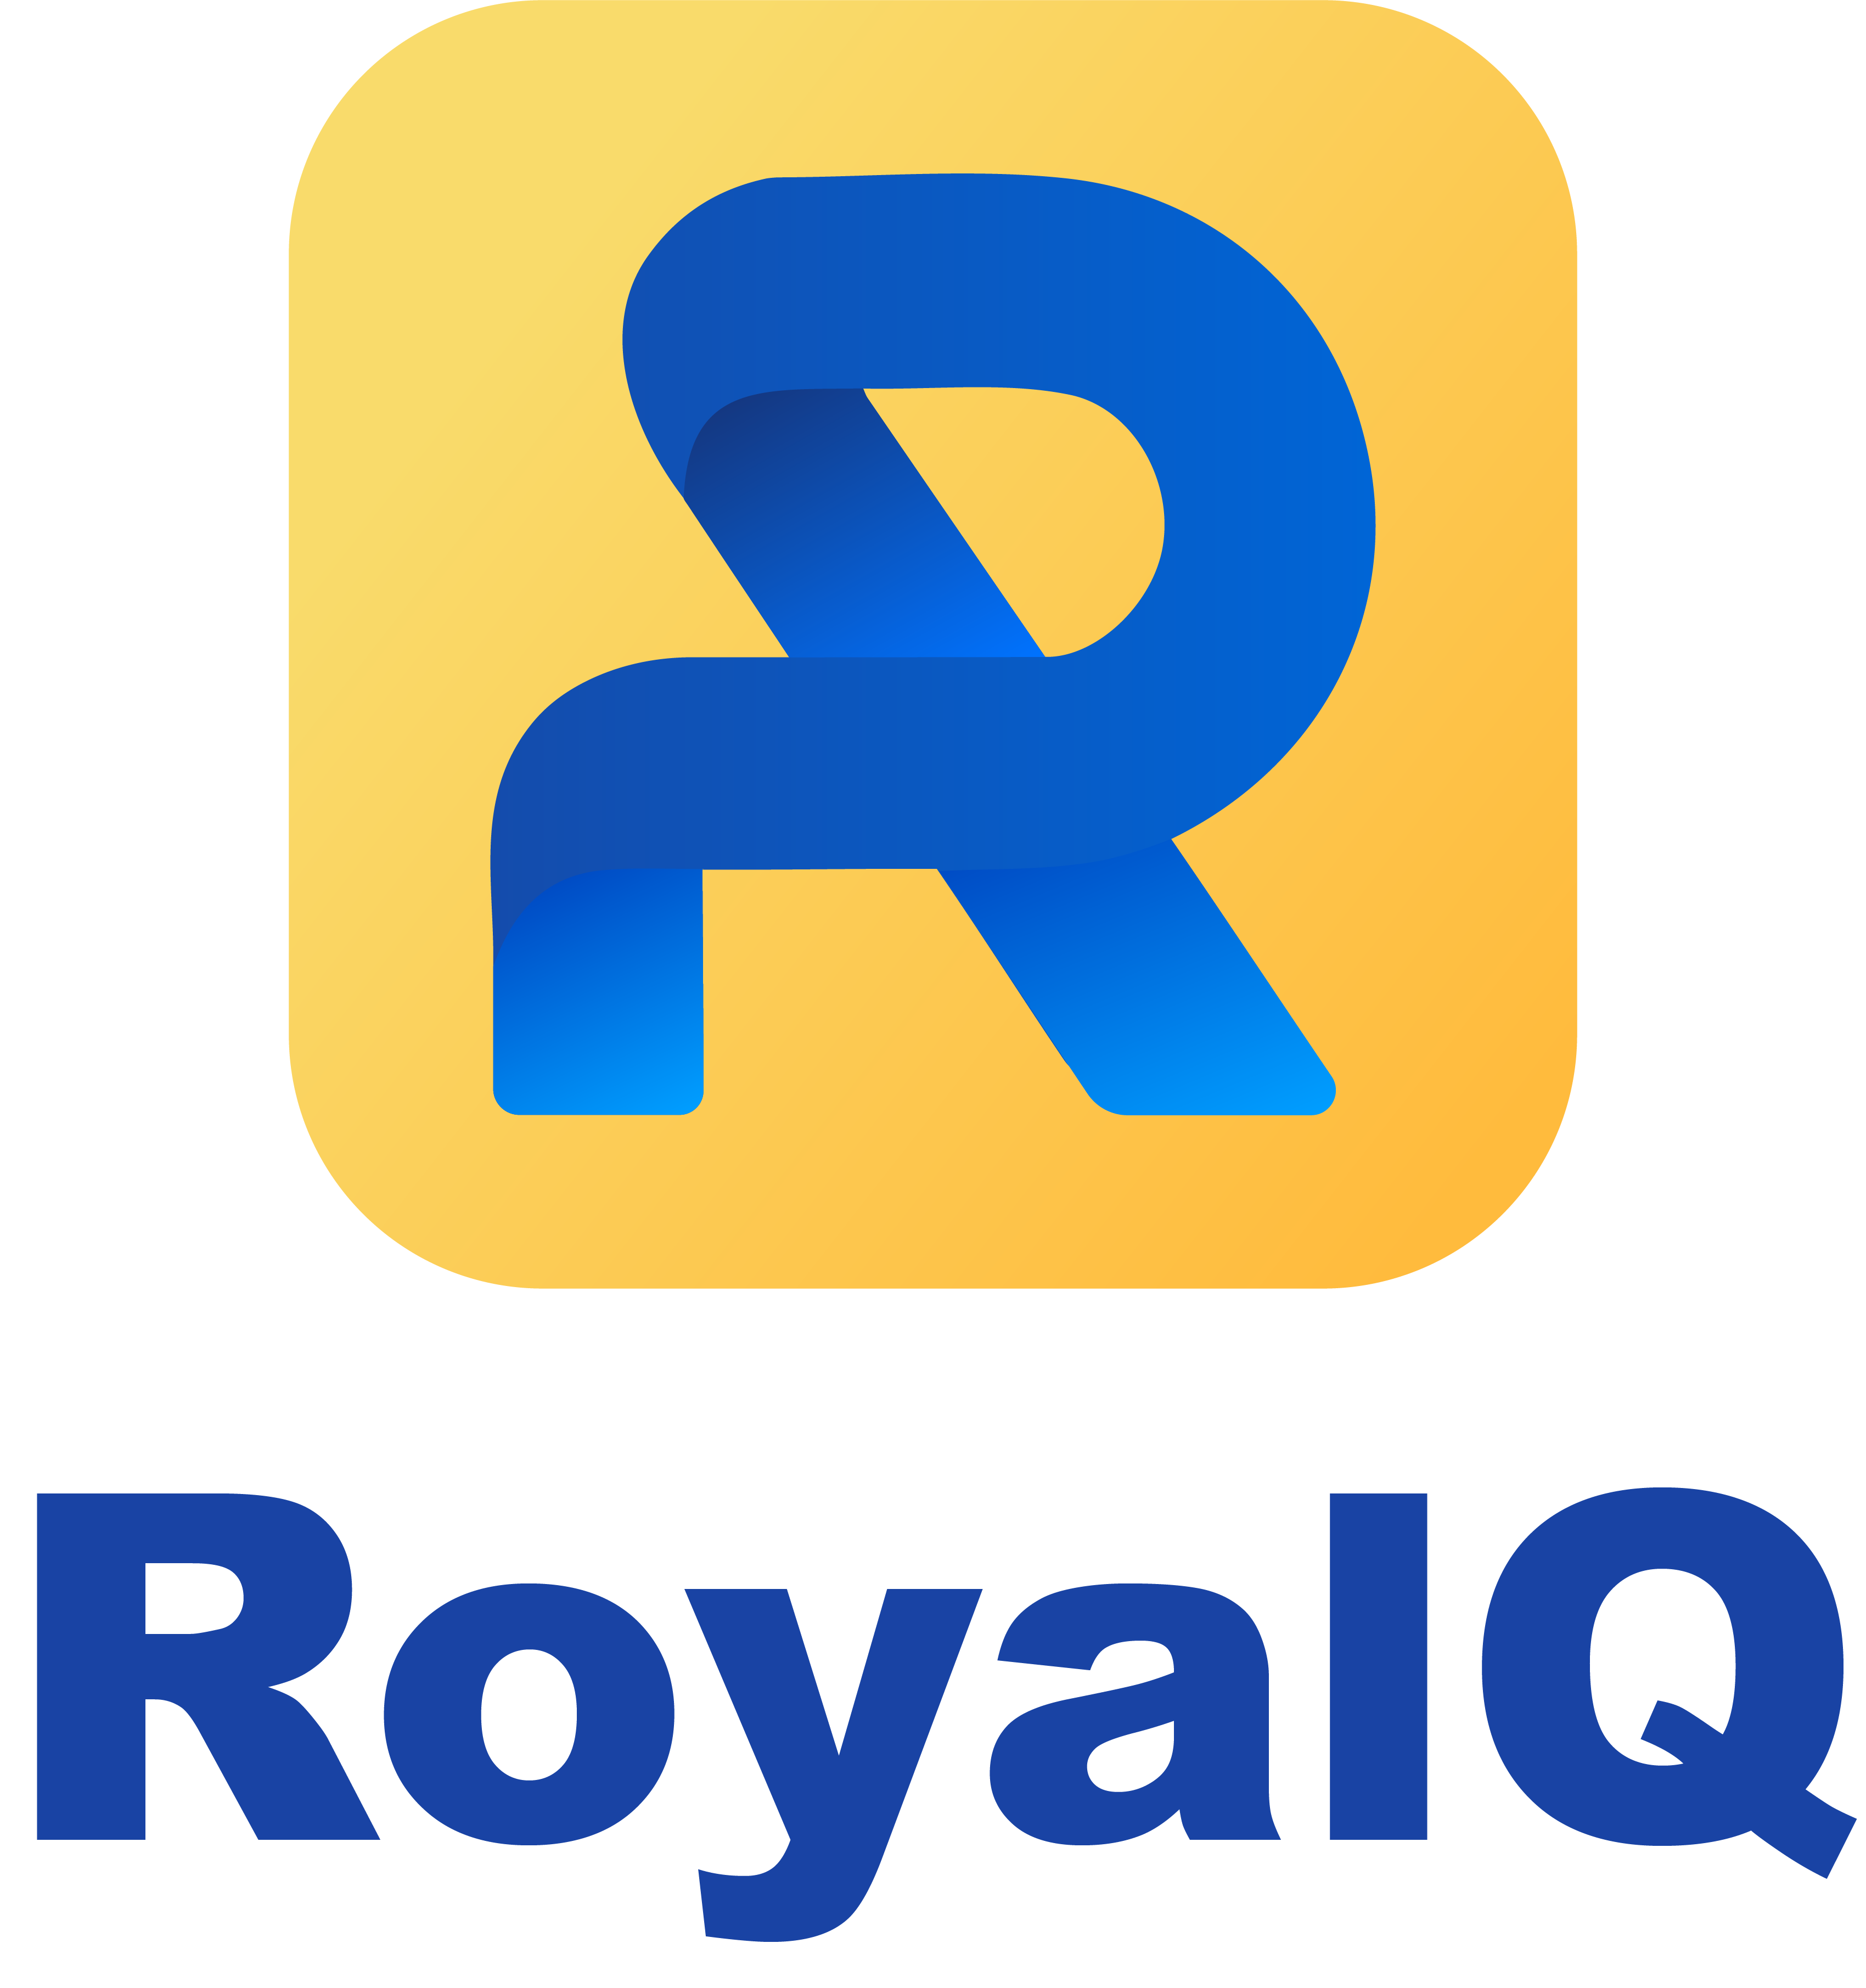 Royal Q aka Royalqs.com Customer Service Contact Details  Is it Legit?   Reviews